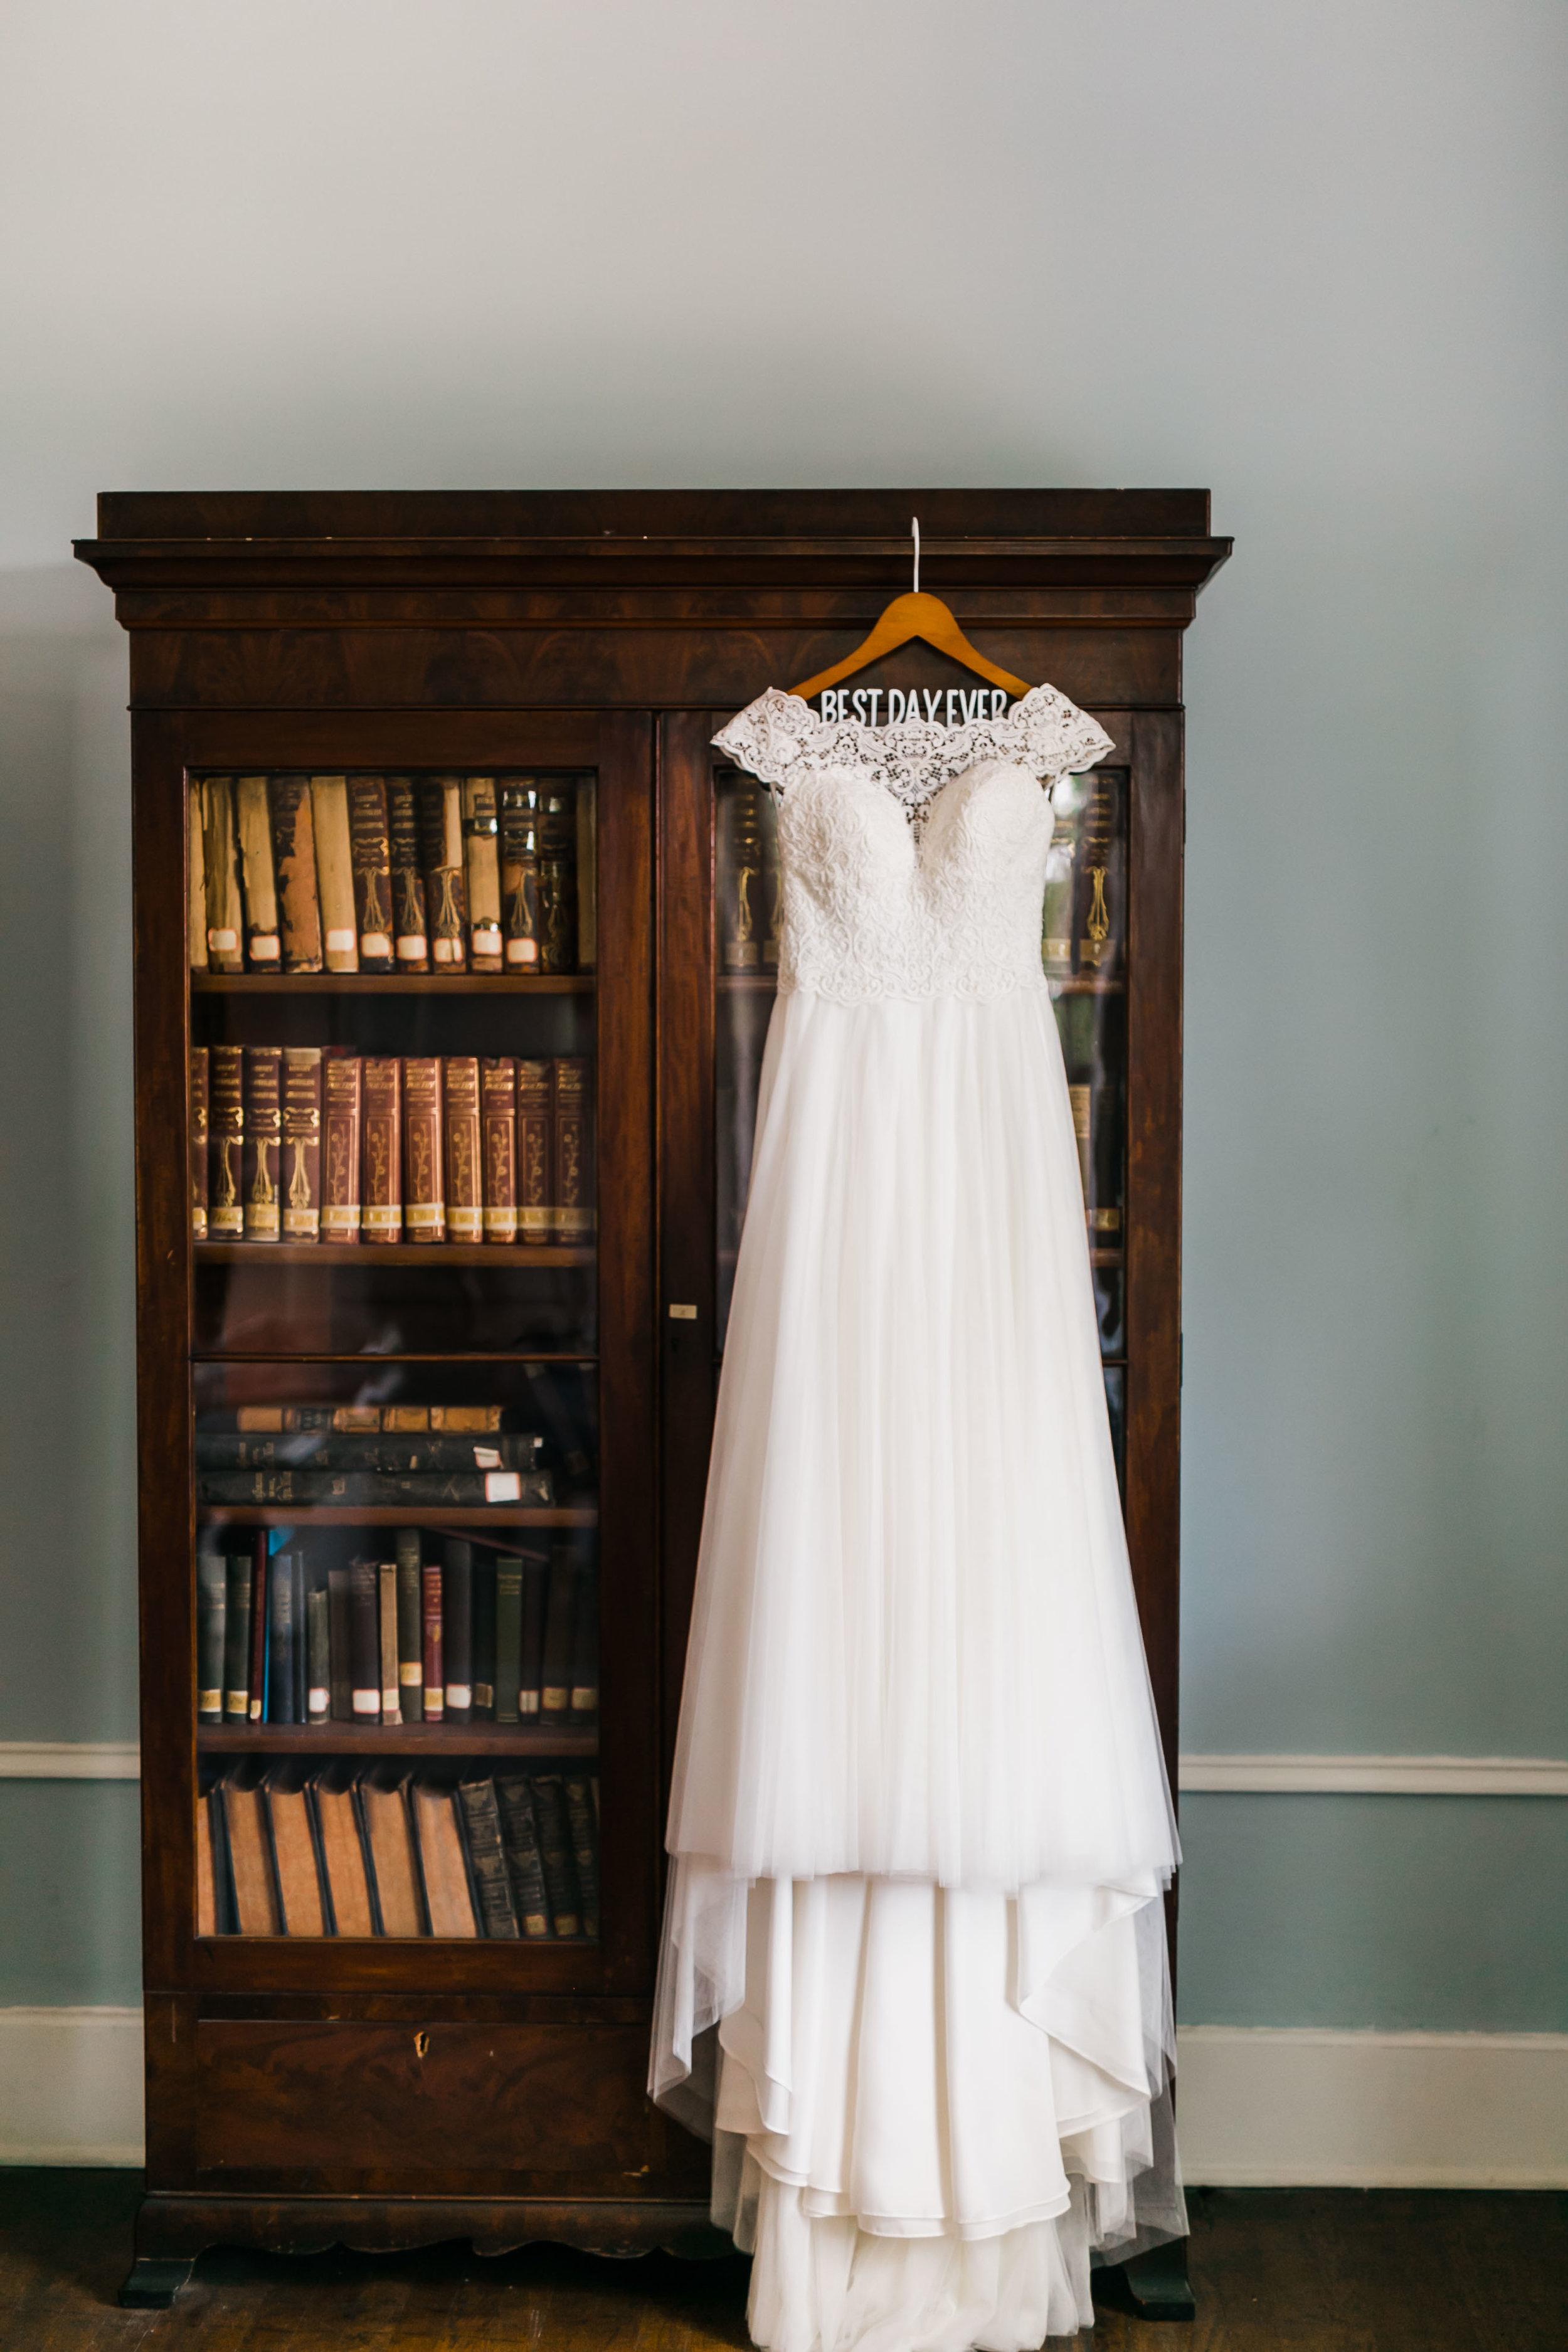 flowy wedding dress on best day ever hanger hanging on bookcase in historic bleak house